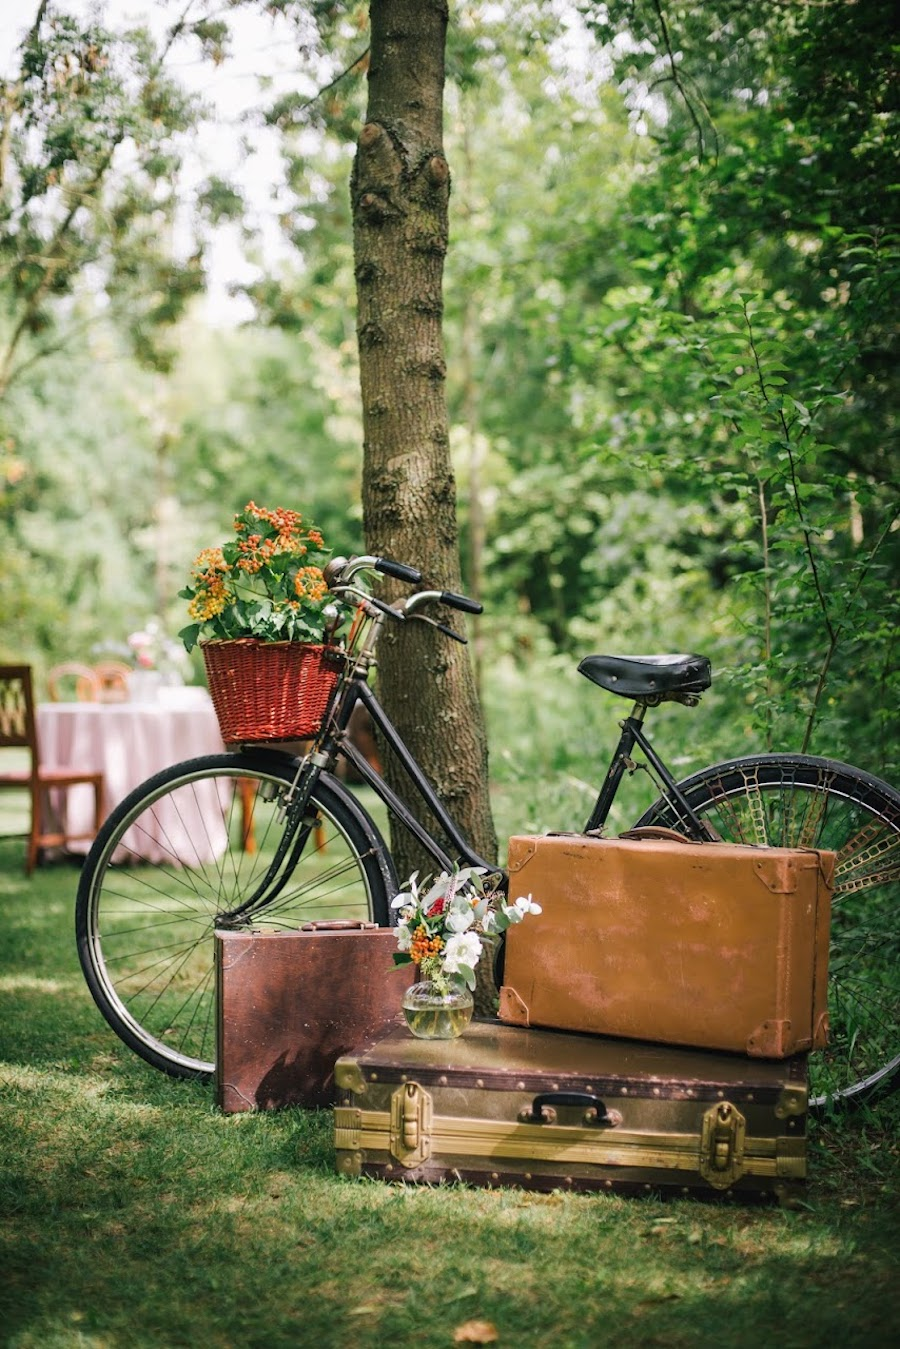 allestimento matrimonio con bicicletta vintage